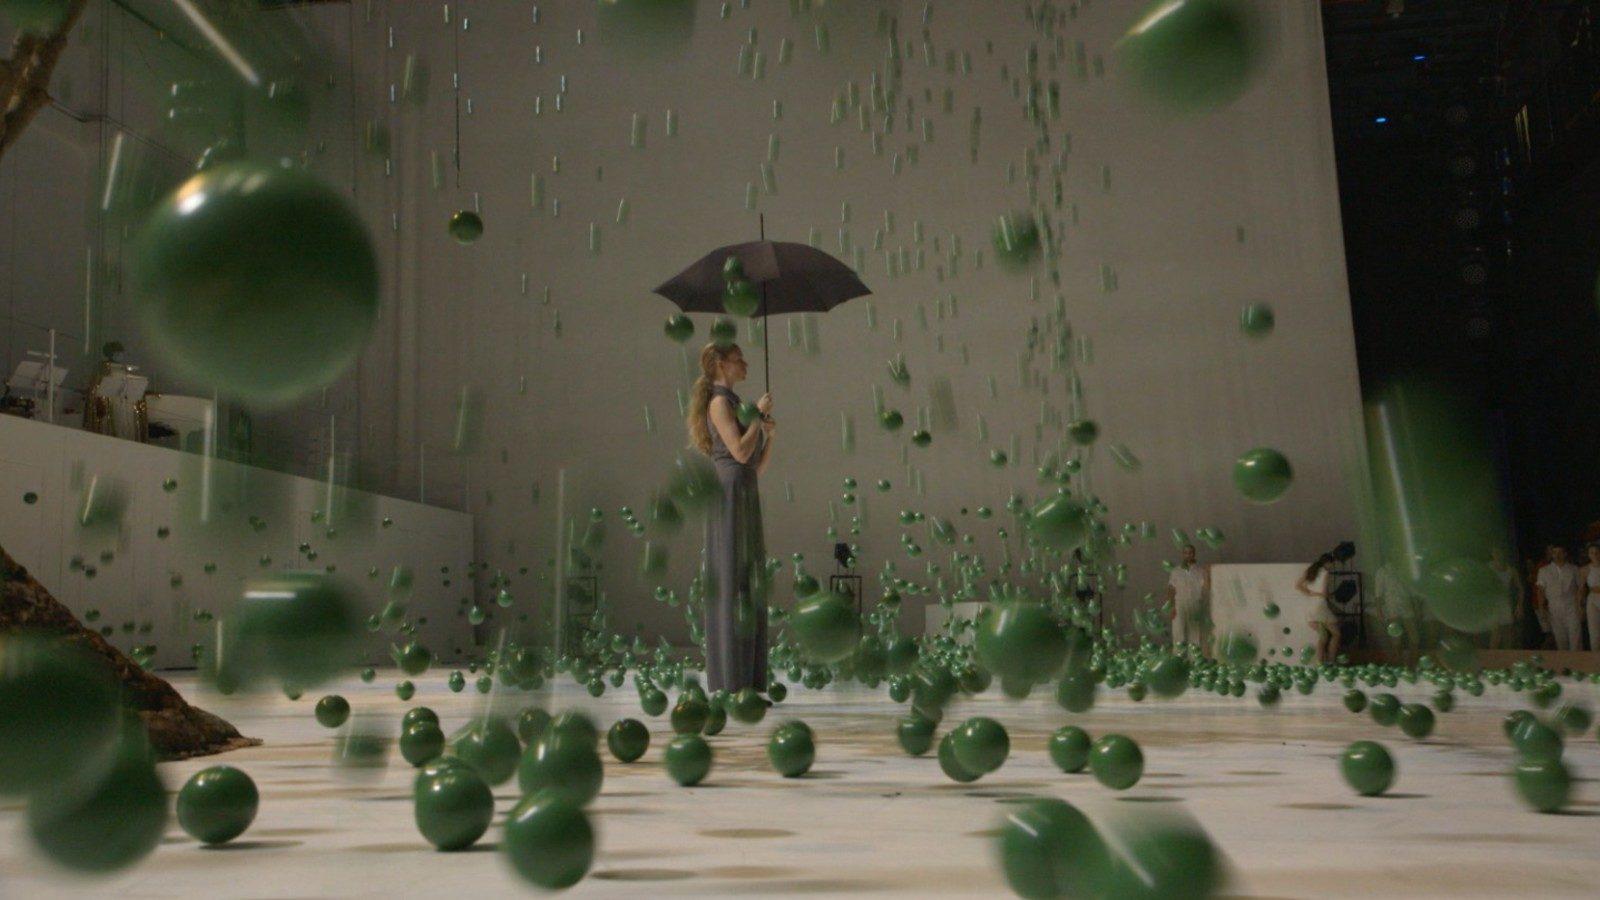 Alexander Ekman choreographer from Sweden, scene of his ballet, ballerina with umbrella, raining green balls